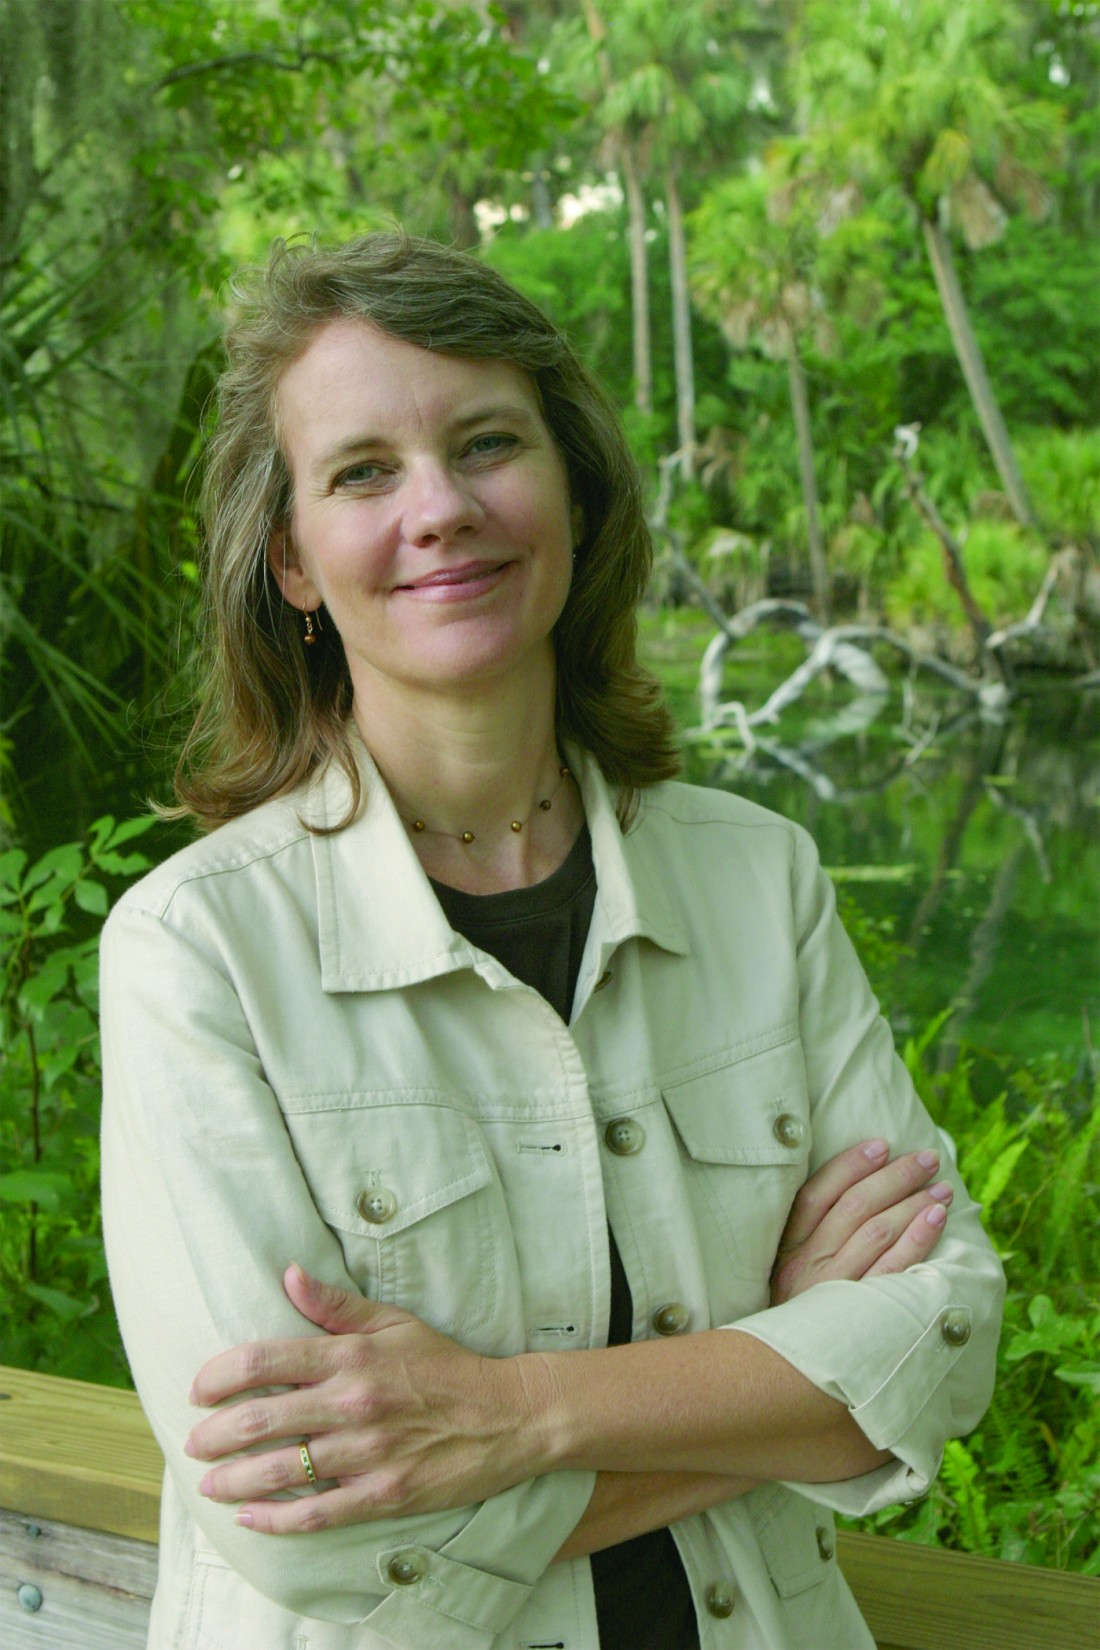 12-19-11 Cynthia Barnett